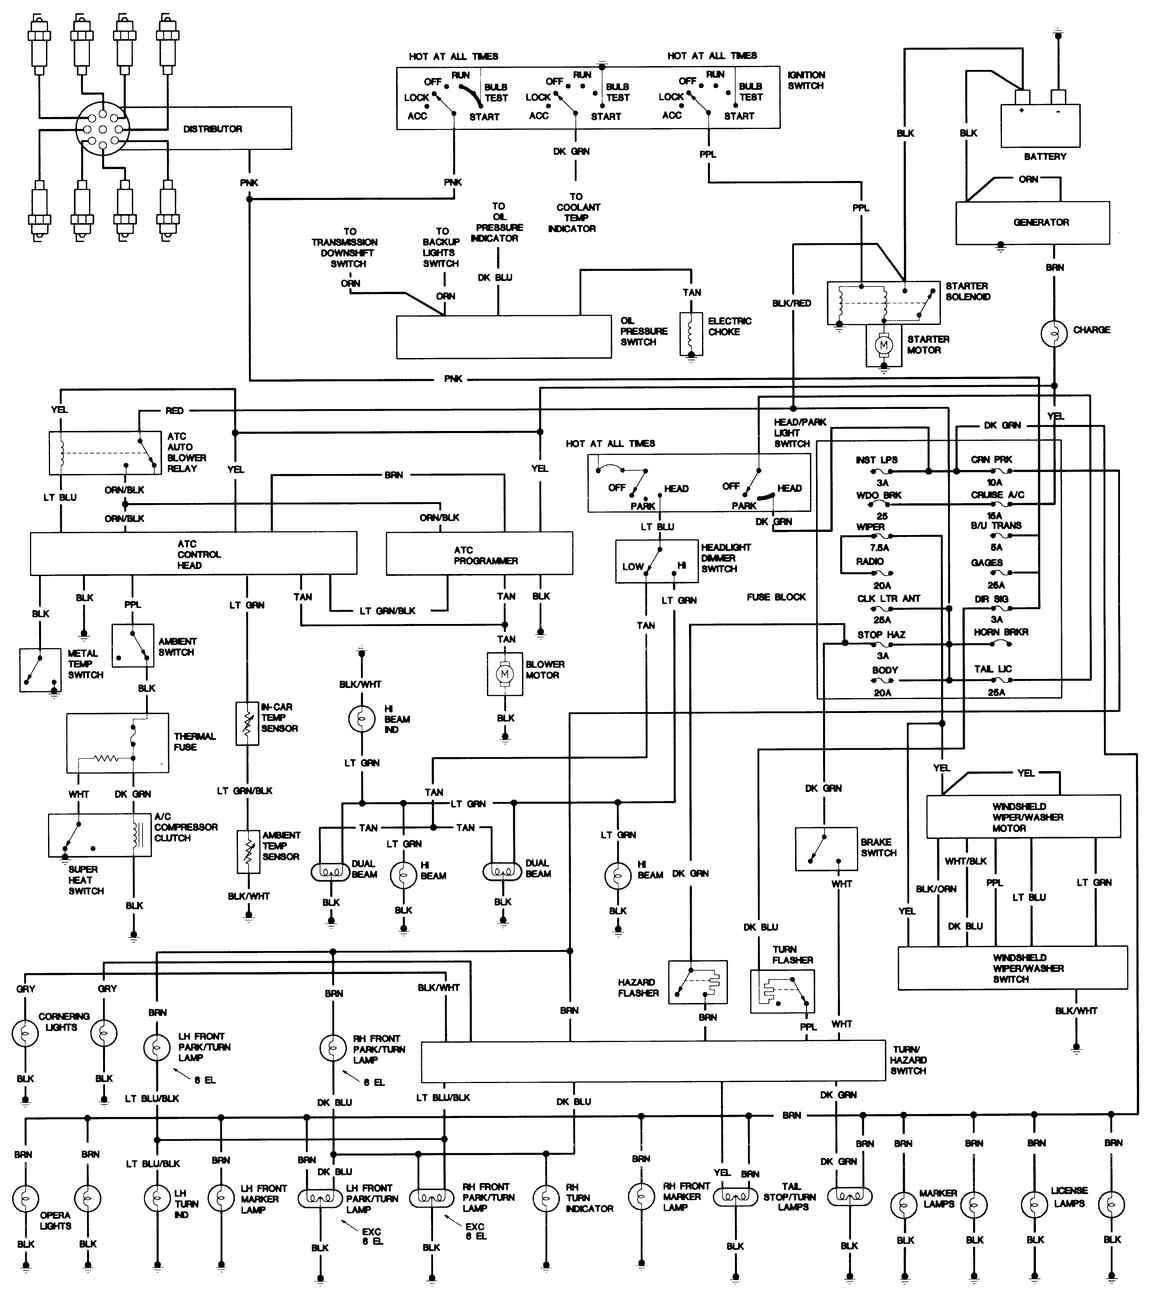 [DIAGRAM] Mercury Verado Dts Wiring Diagram FULL Version